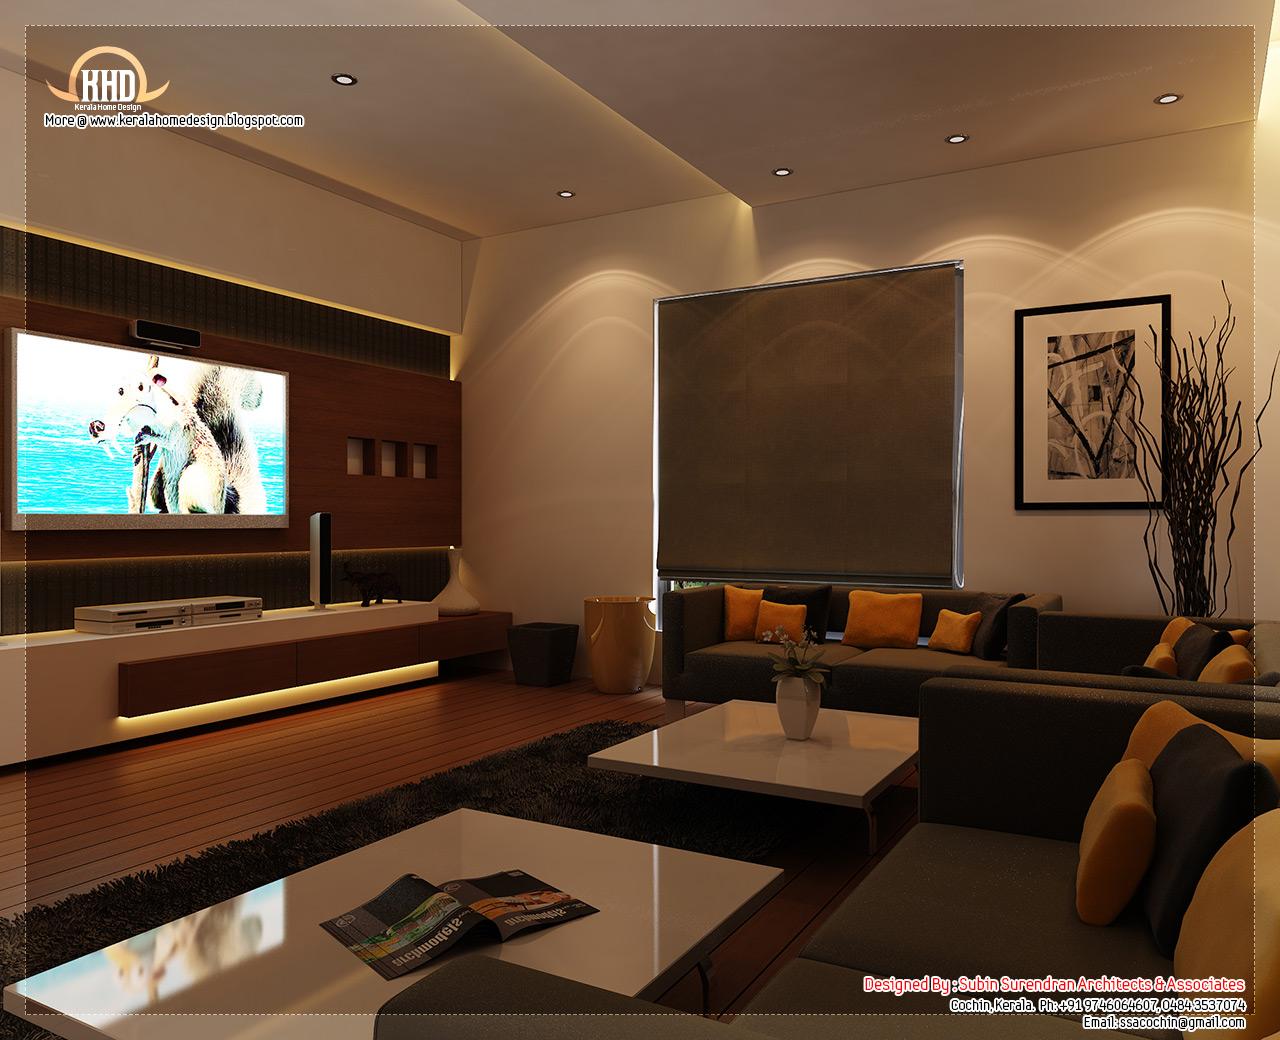 Beautiful home interior designs - Kerala home design and ...